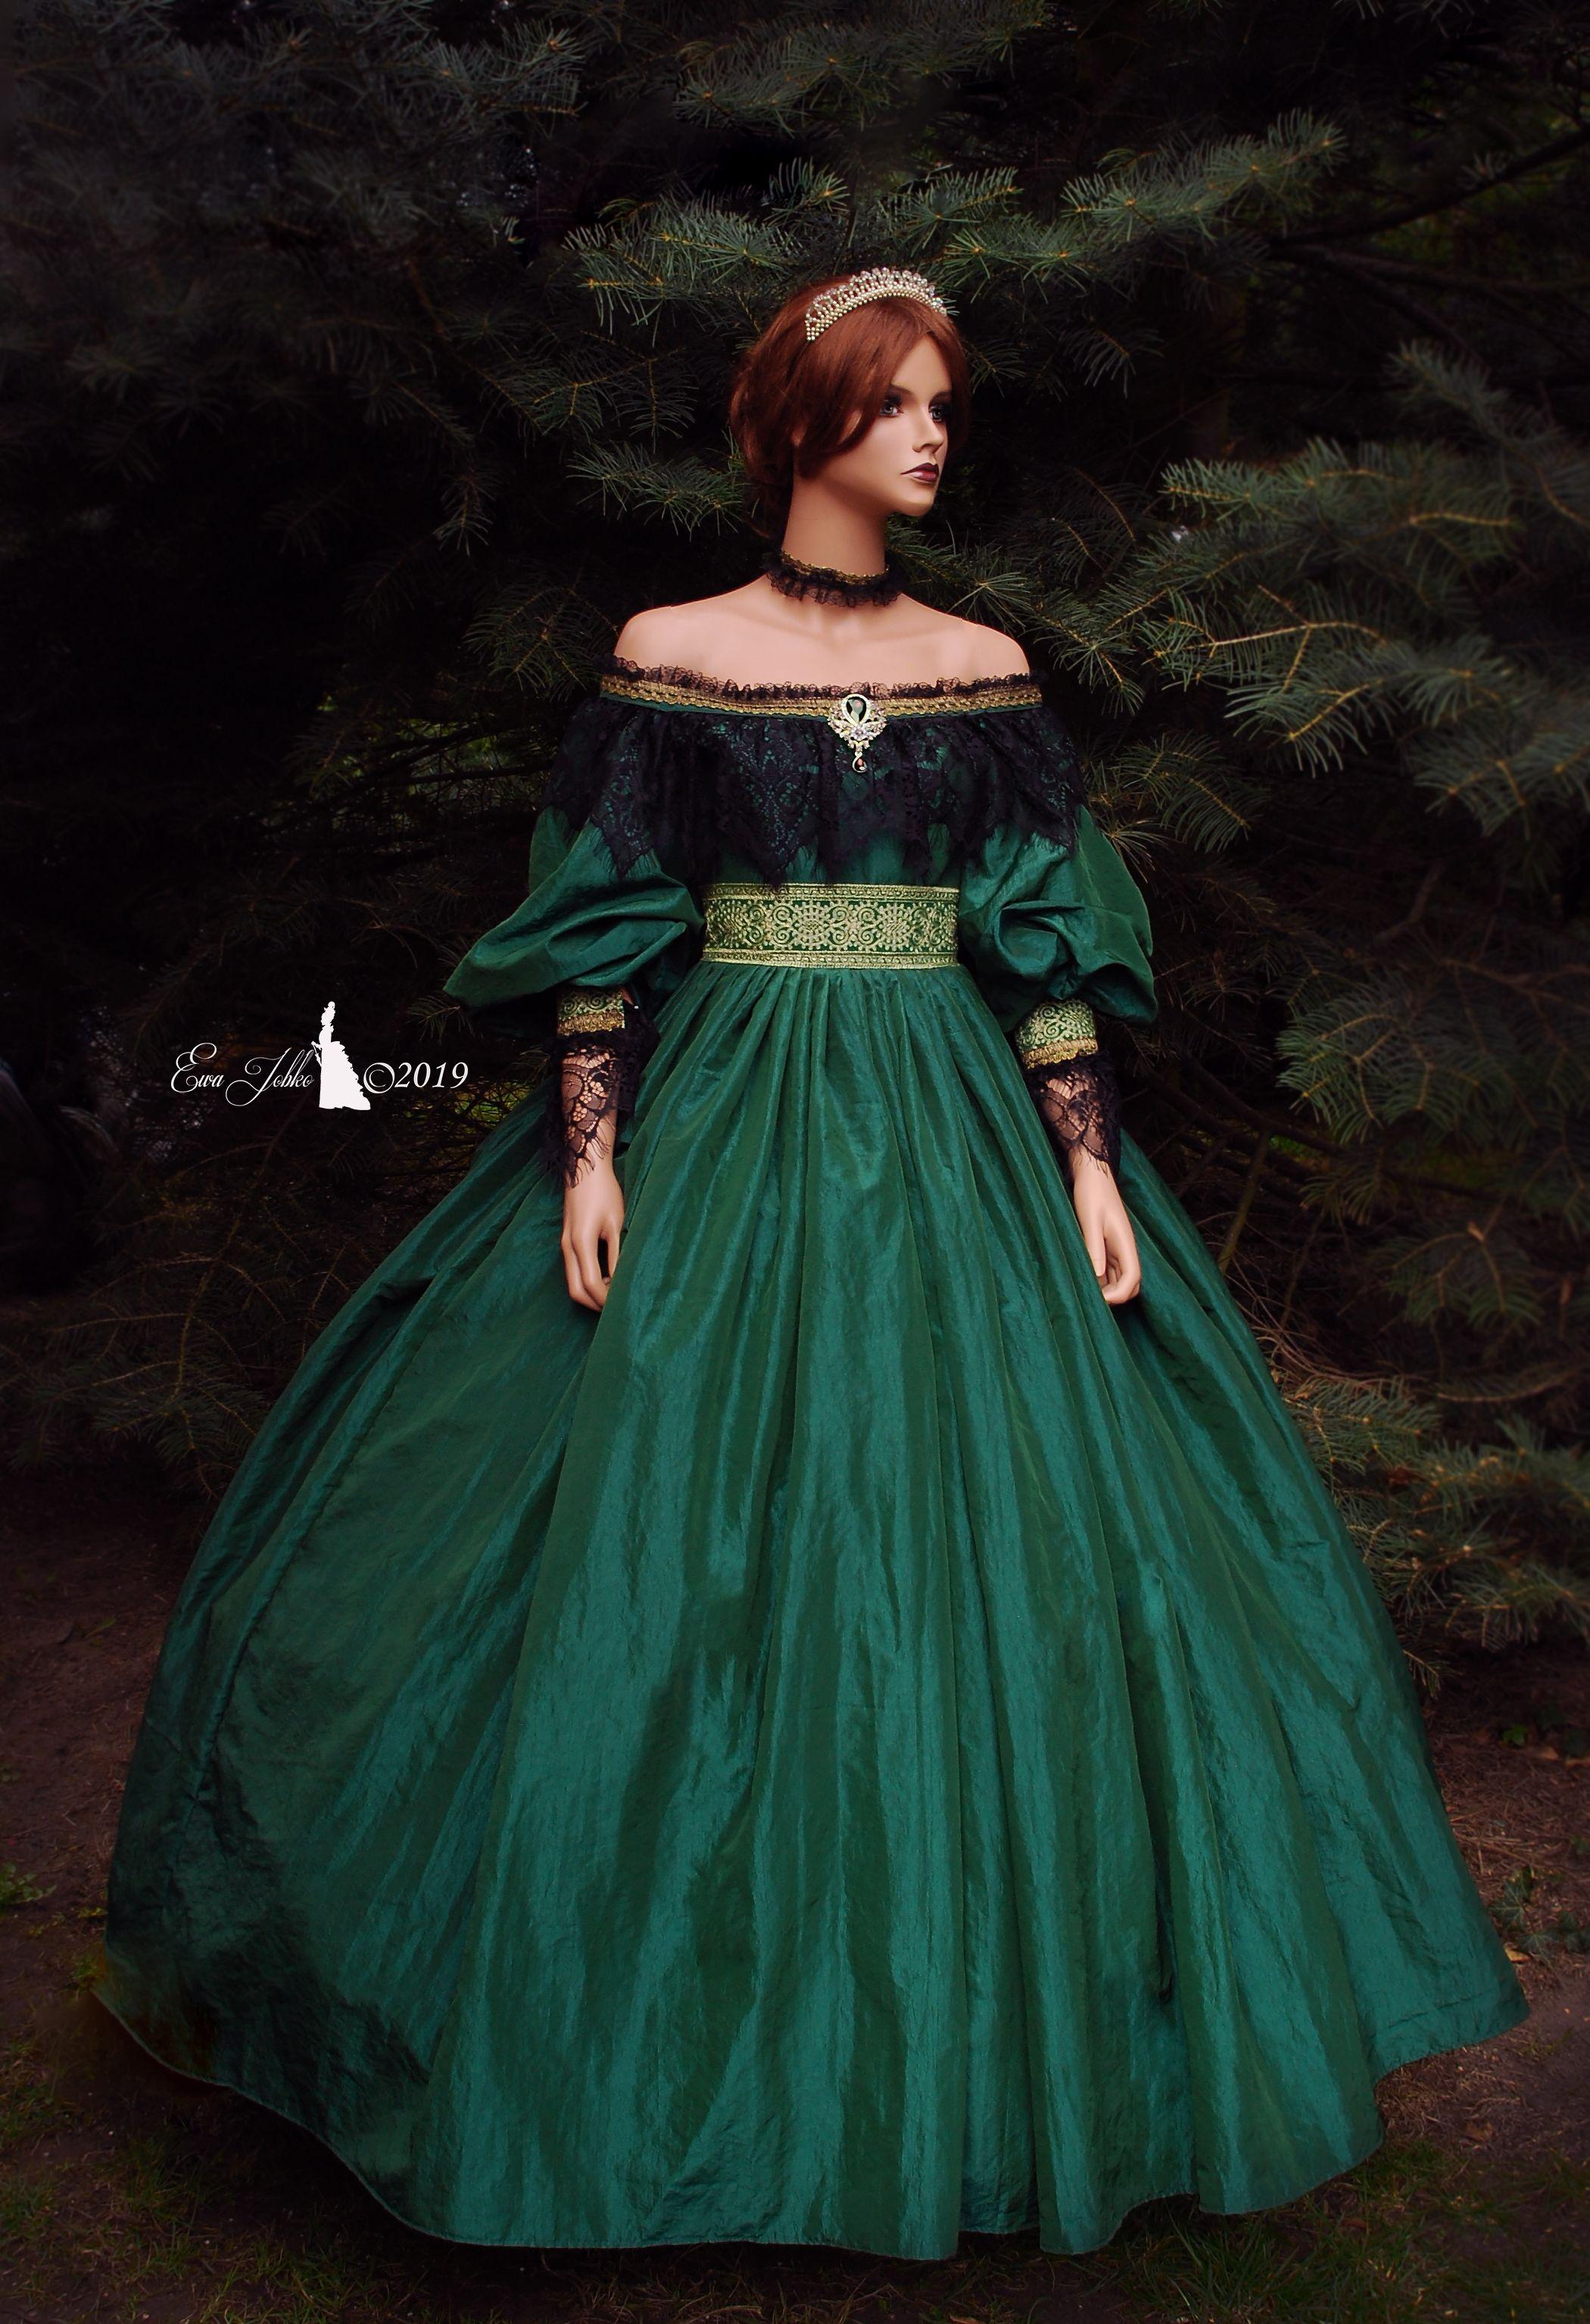 Pin By Ewa Jobko On My Work Victorian Dress Gown Queen Dress Victorian Gown [ 3069 x 2100 Pixel ]